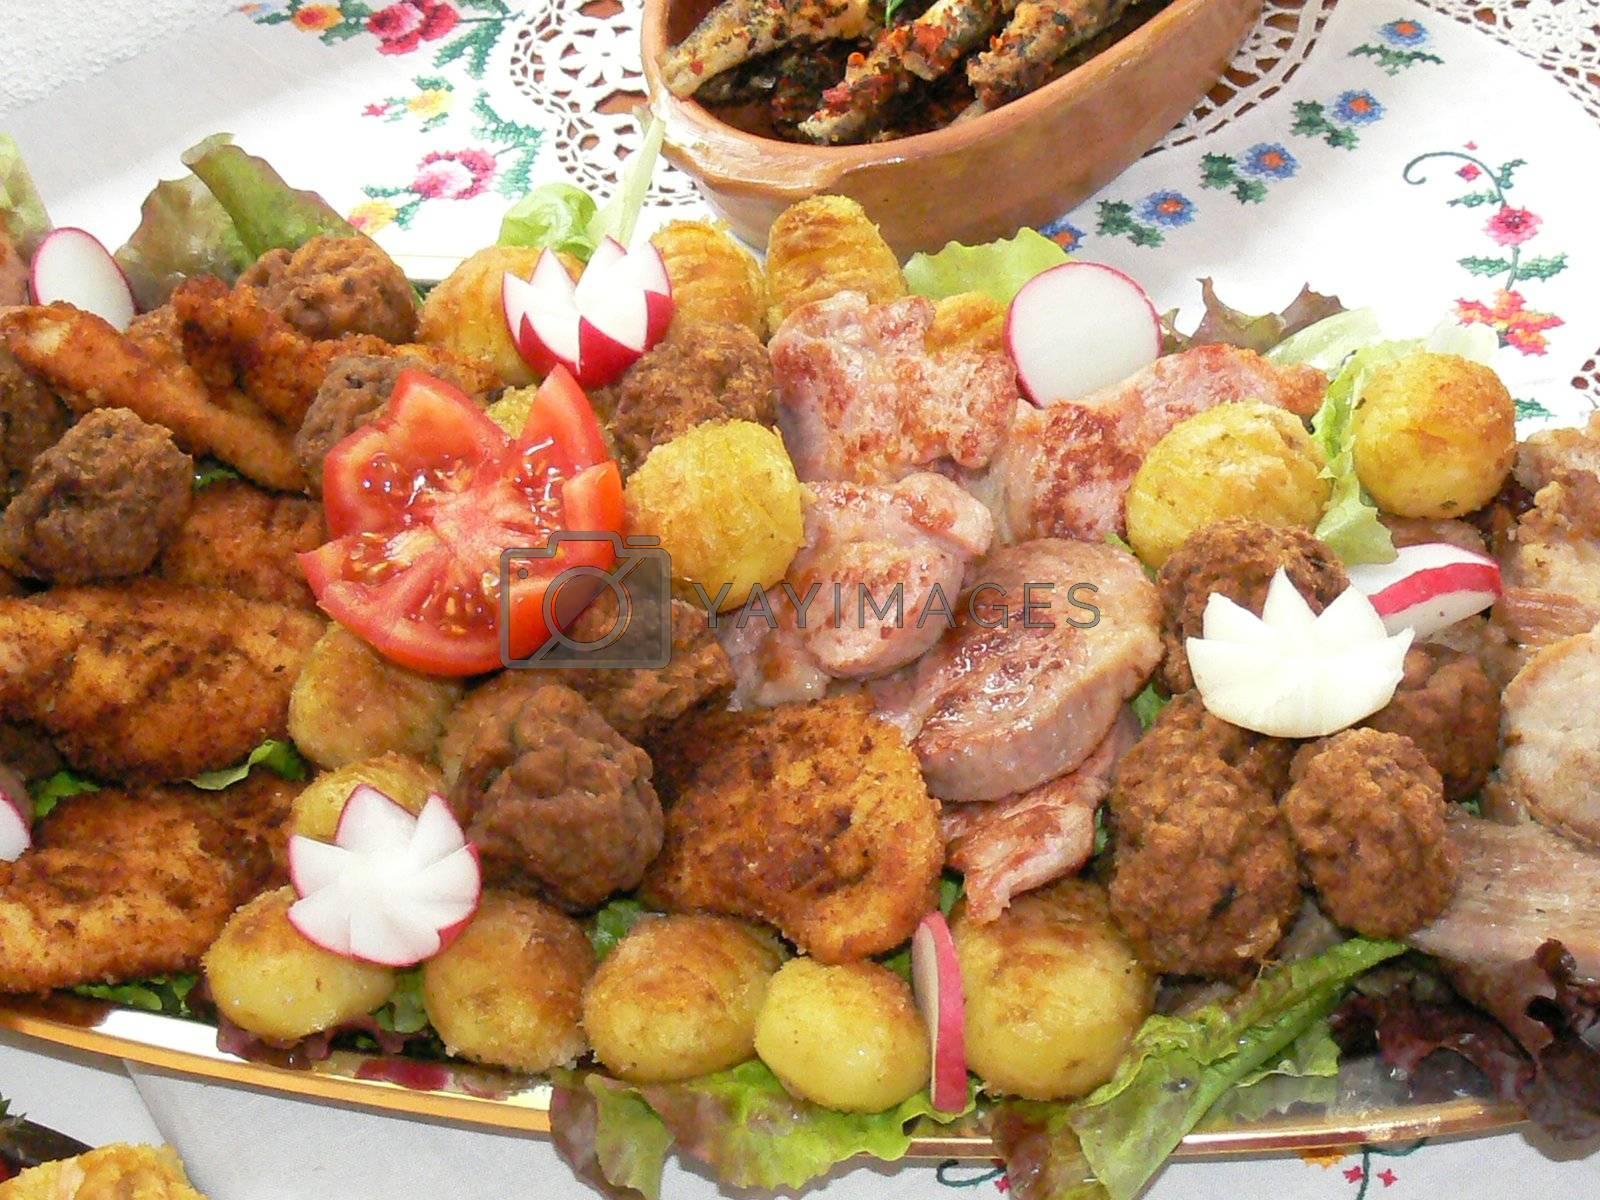 tasty grilled food